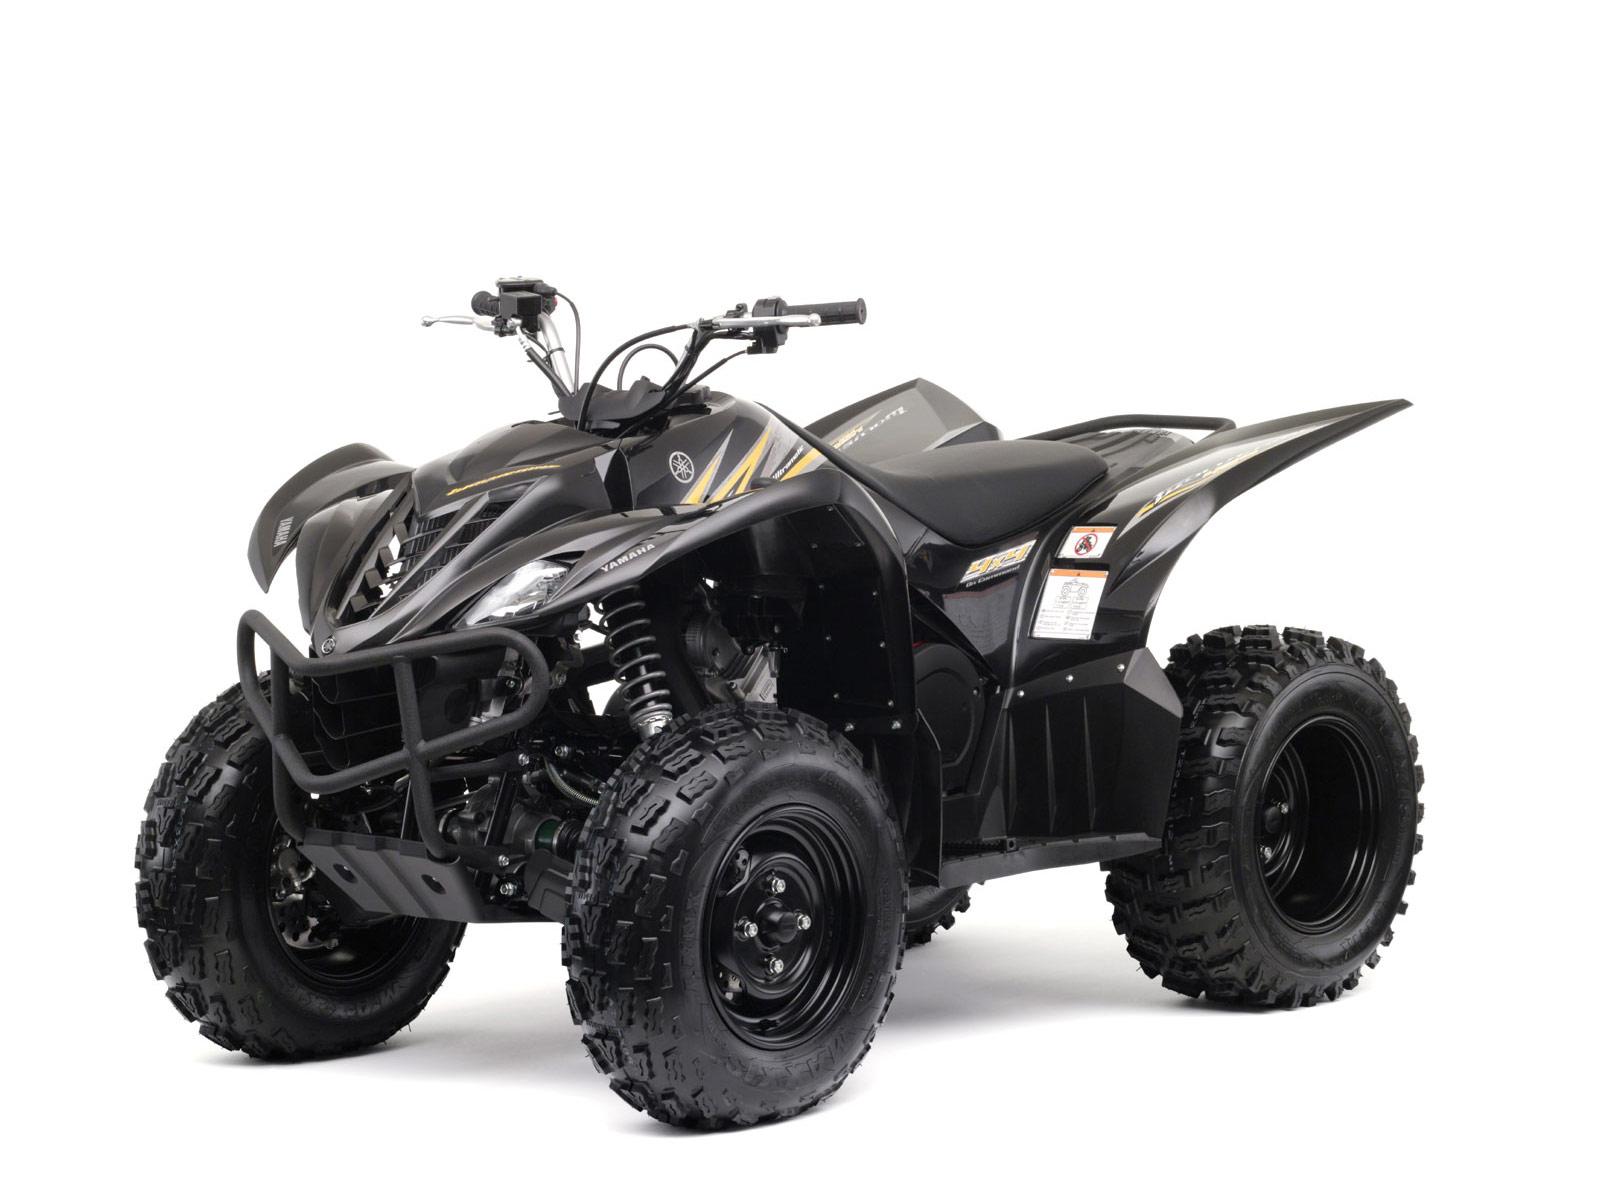 2006-Yamaha-Wolverine-450-Sport-4WD Yamaha Wolverine 450 For Sale